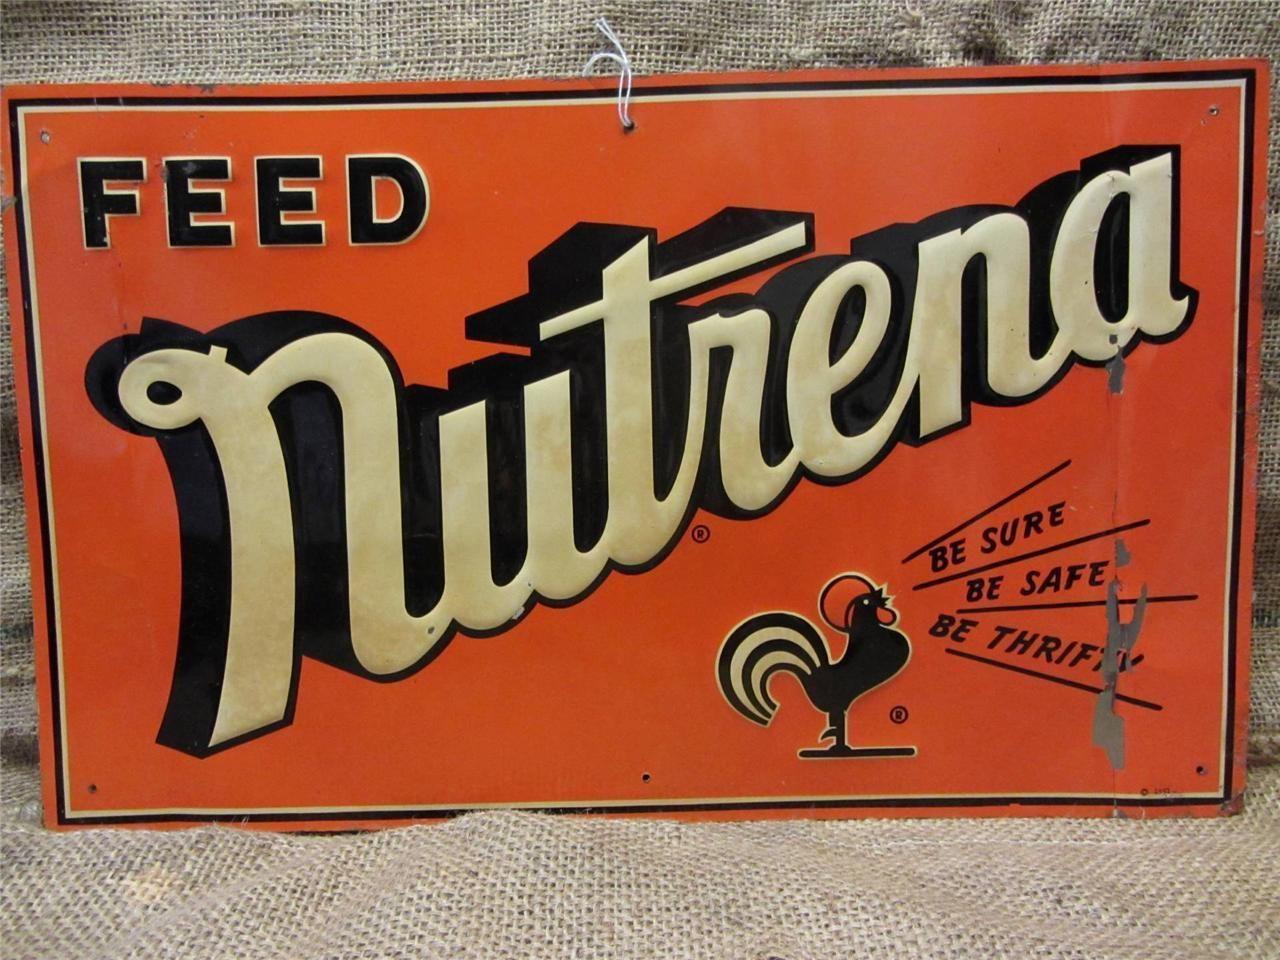 Vintage 1951 Embossed Nutrena Feed Sign Antique Old Farm Seed Nice Color 9076 Old Farm Farm Seed Vintage Neon Signs